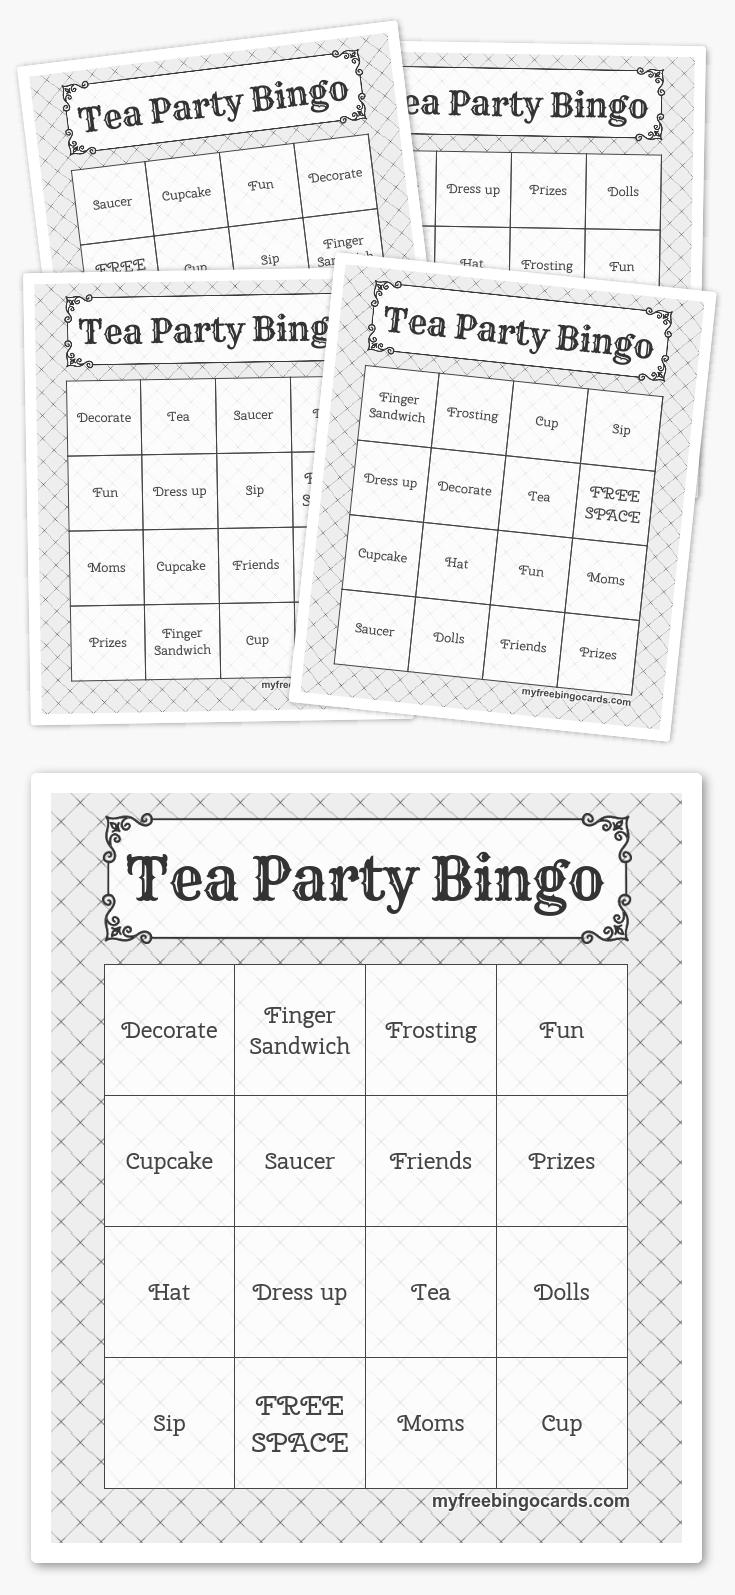 Free Printable Bingo Cards In 2019 | Printables | Harry Potter Games - Free Printable Bingo Cards 1 100